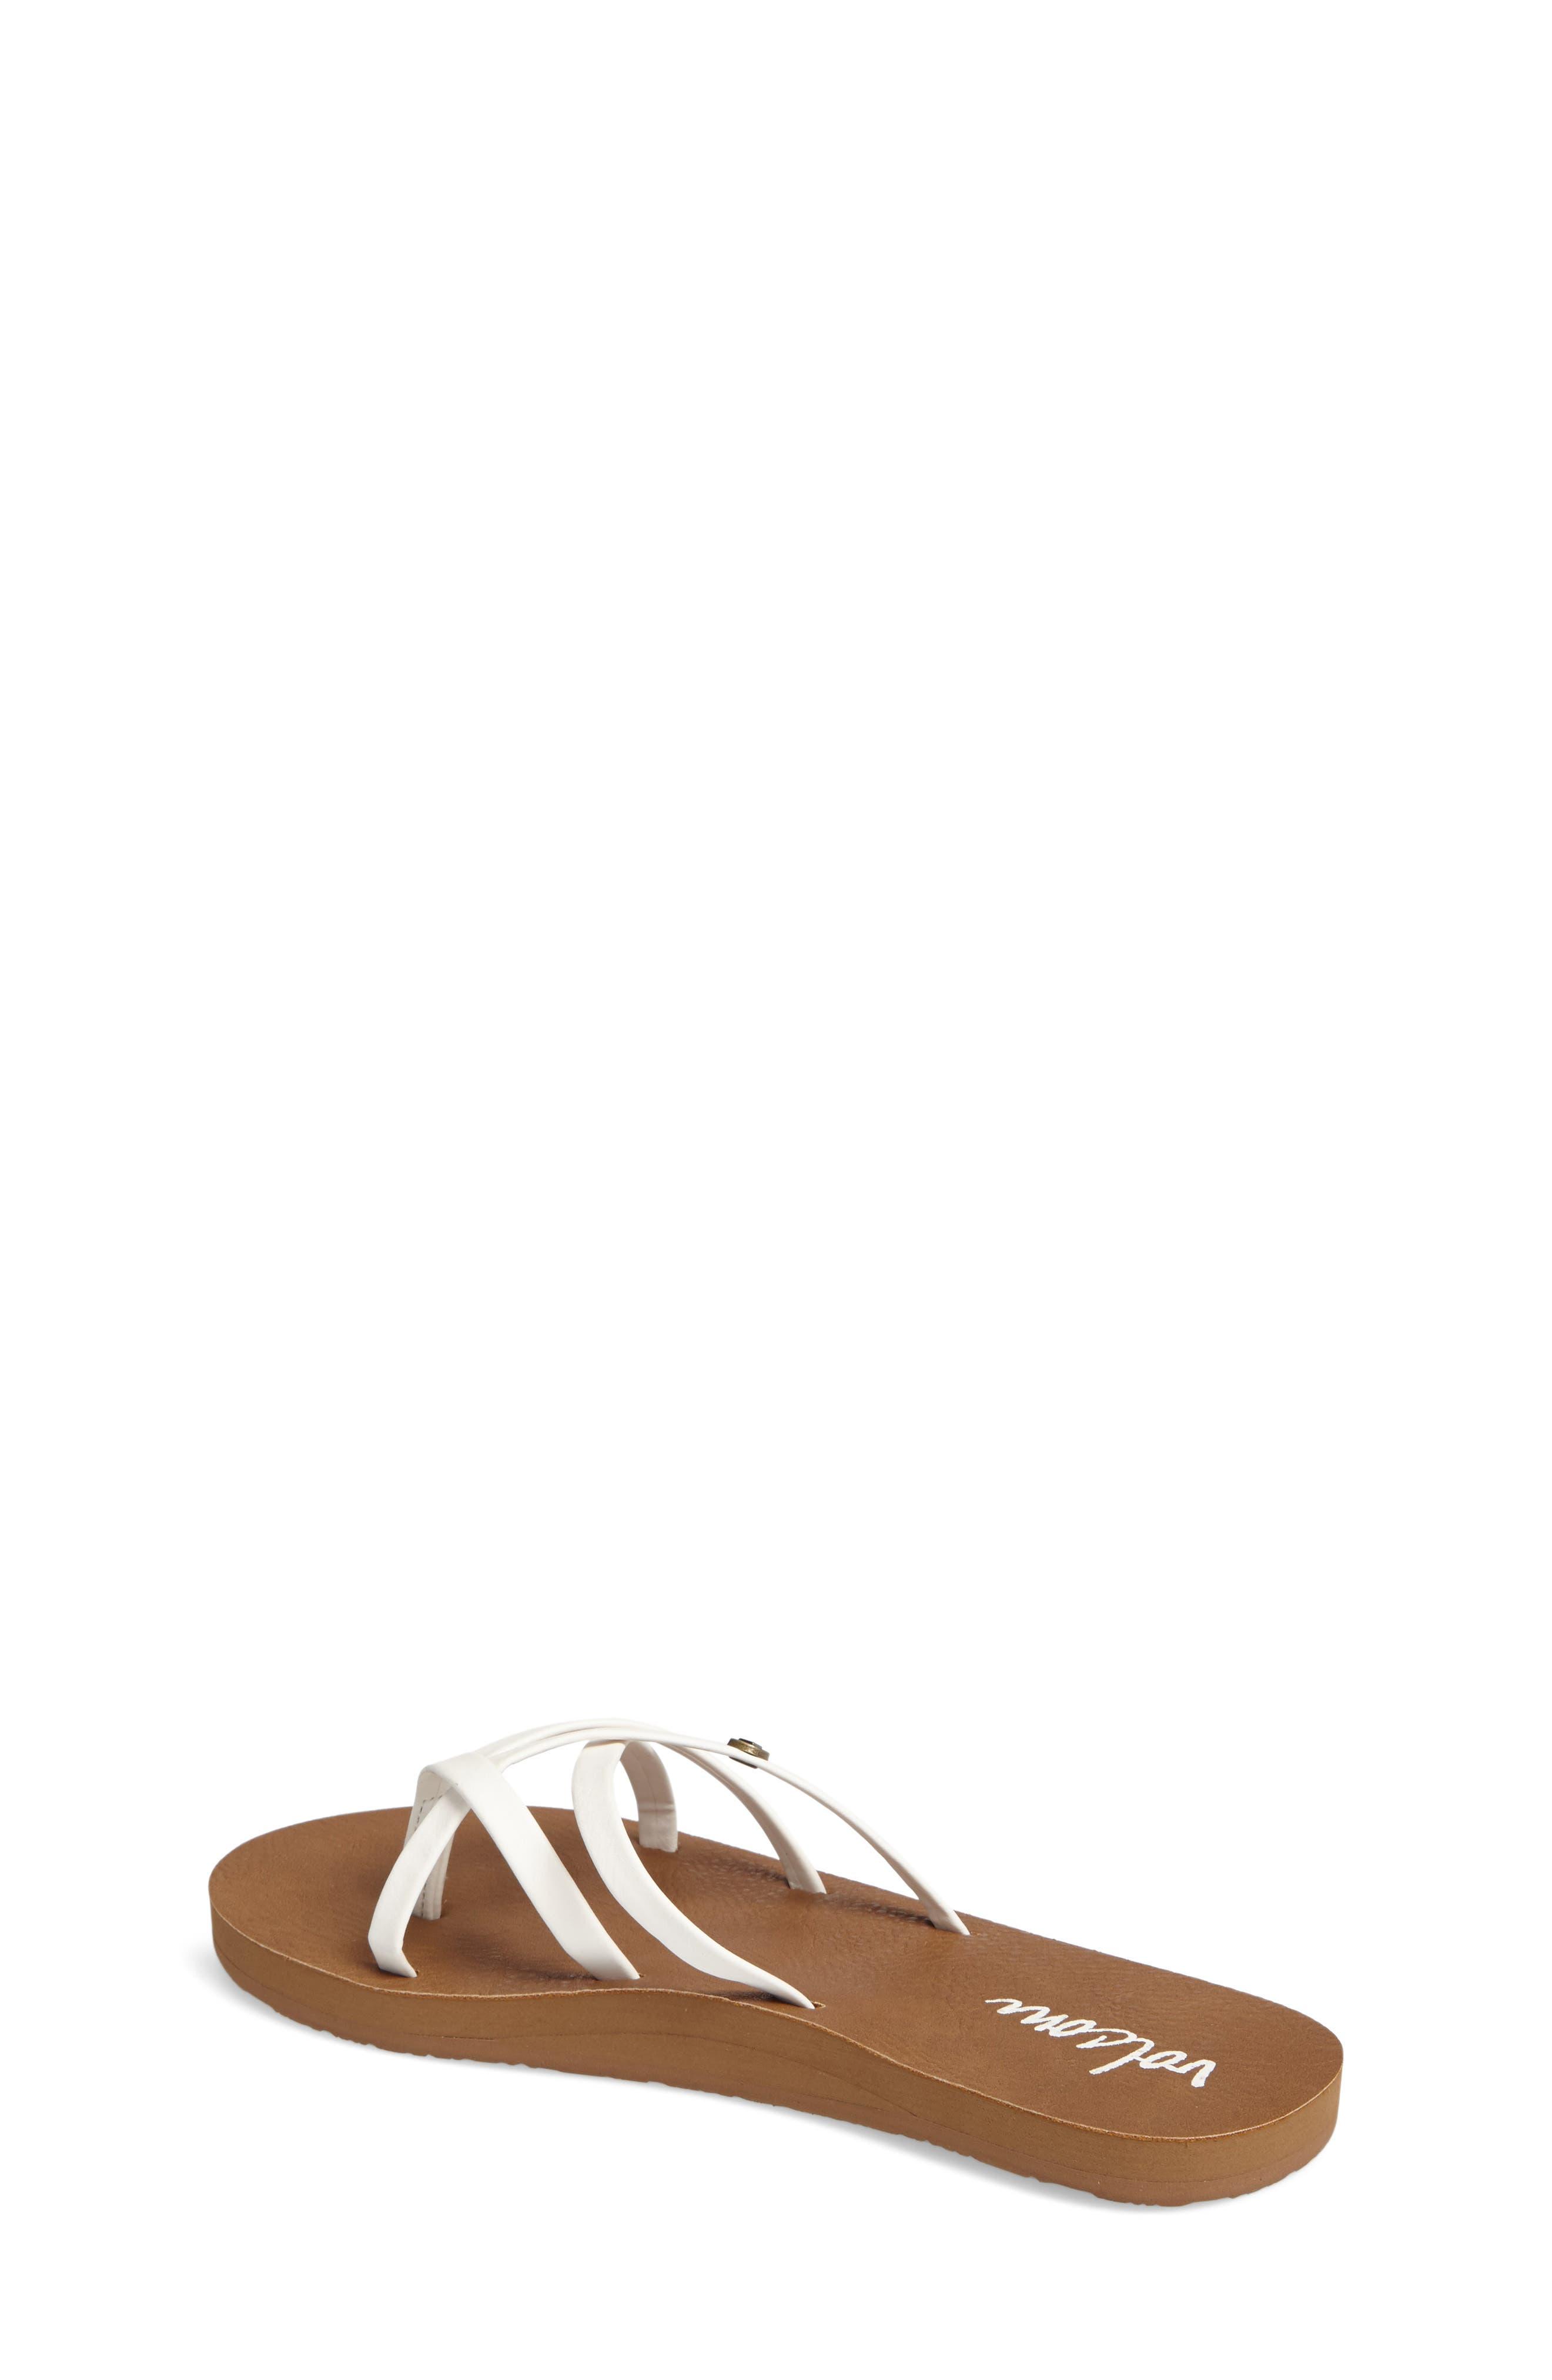 New School Flip Flop,                             Alternate thumbnail 2, color,                             WHITE